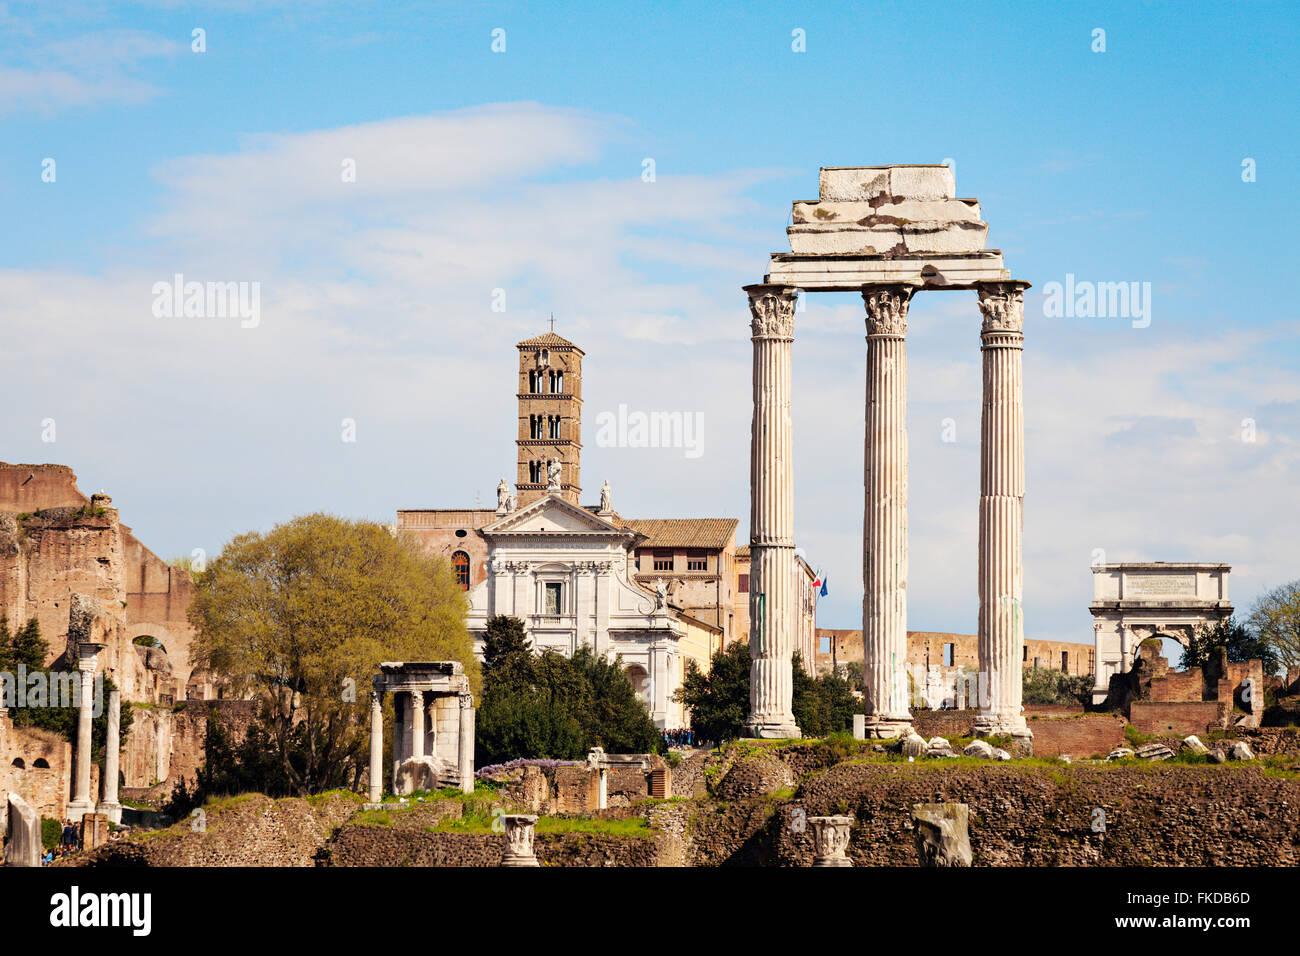 Columns of Roman Forum against blue sky - Stock Image